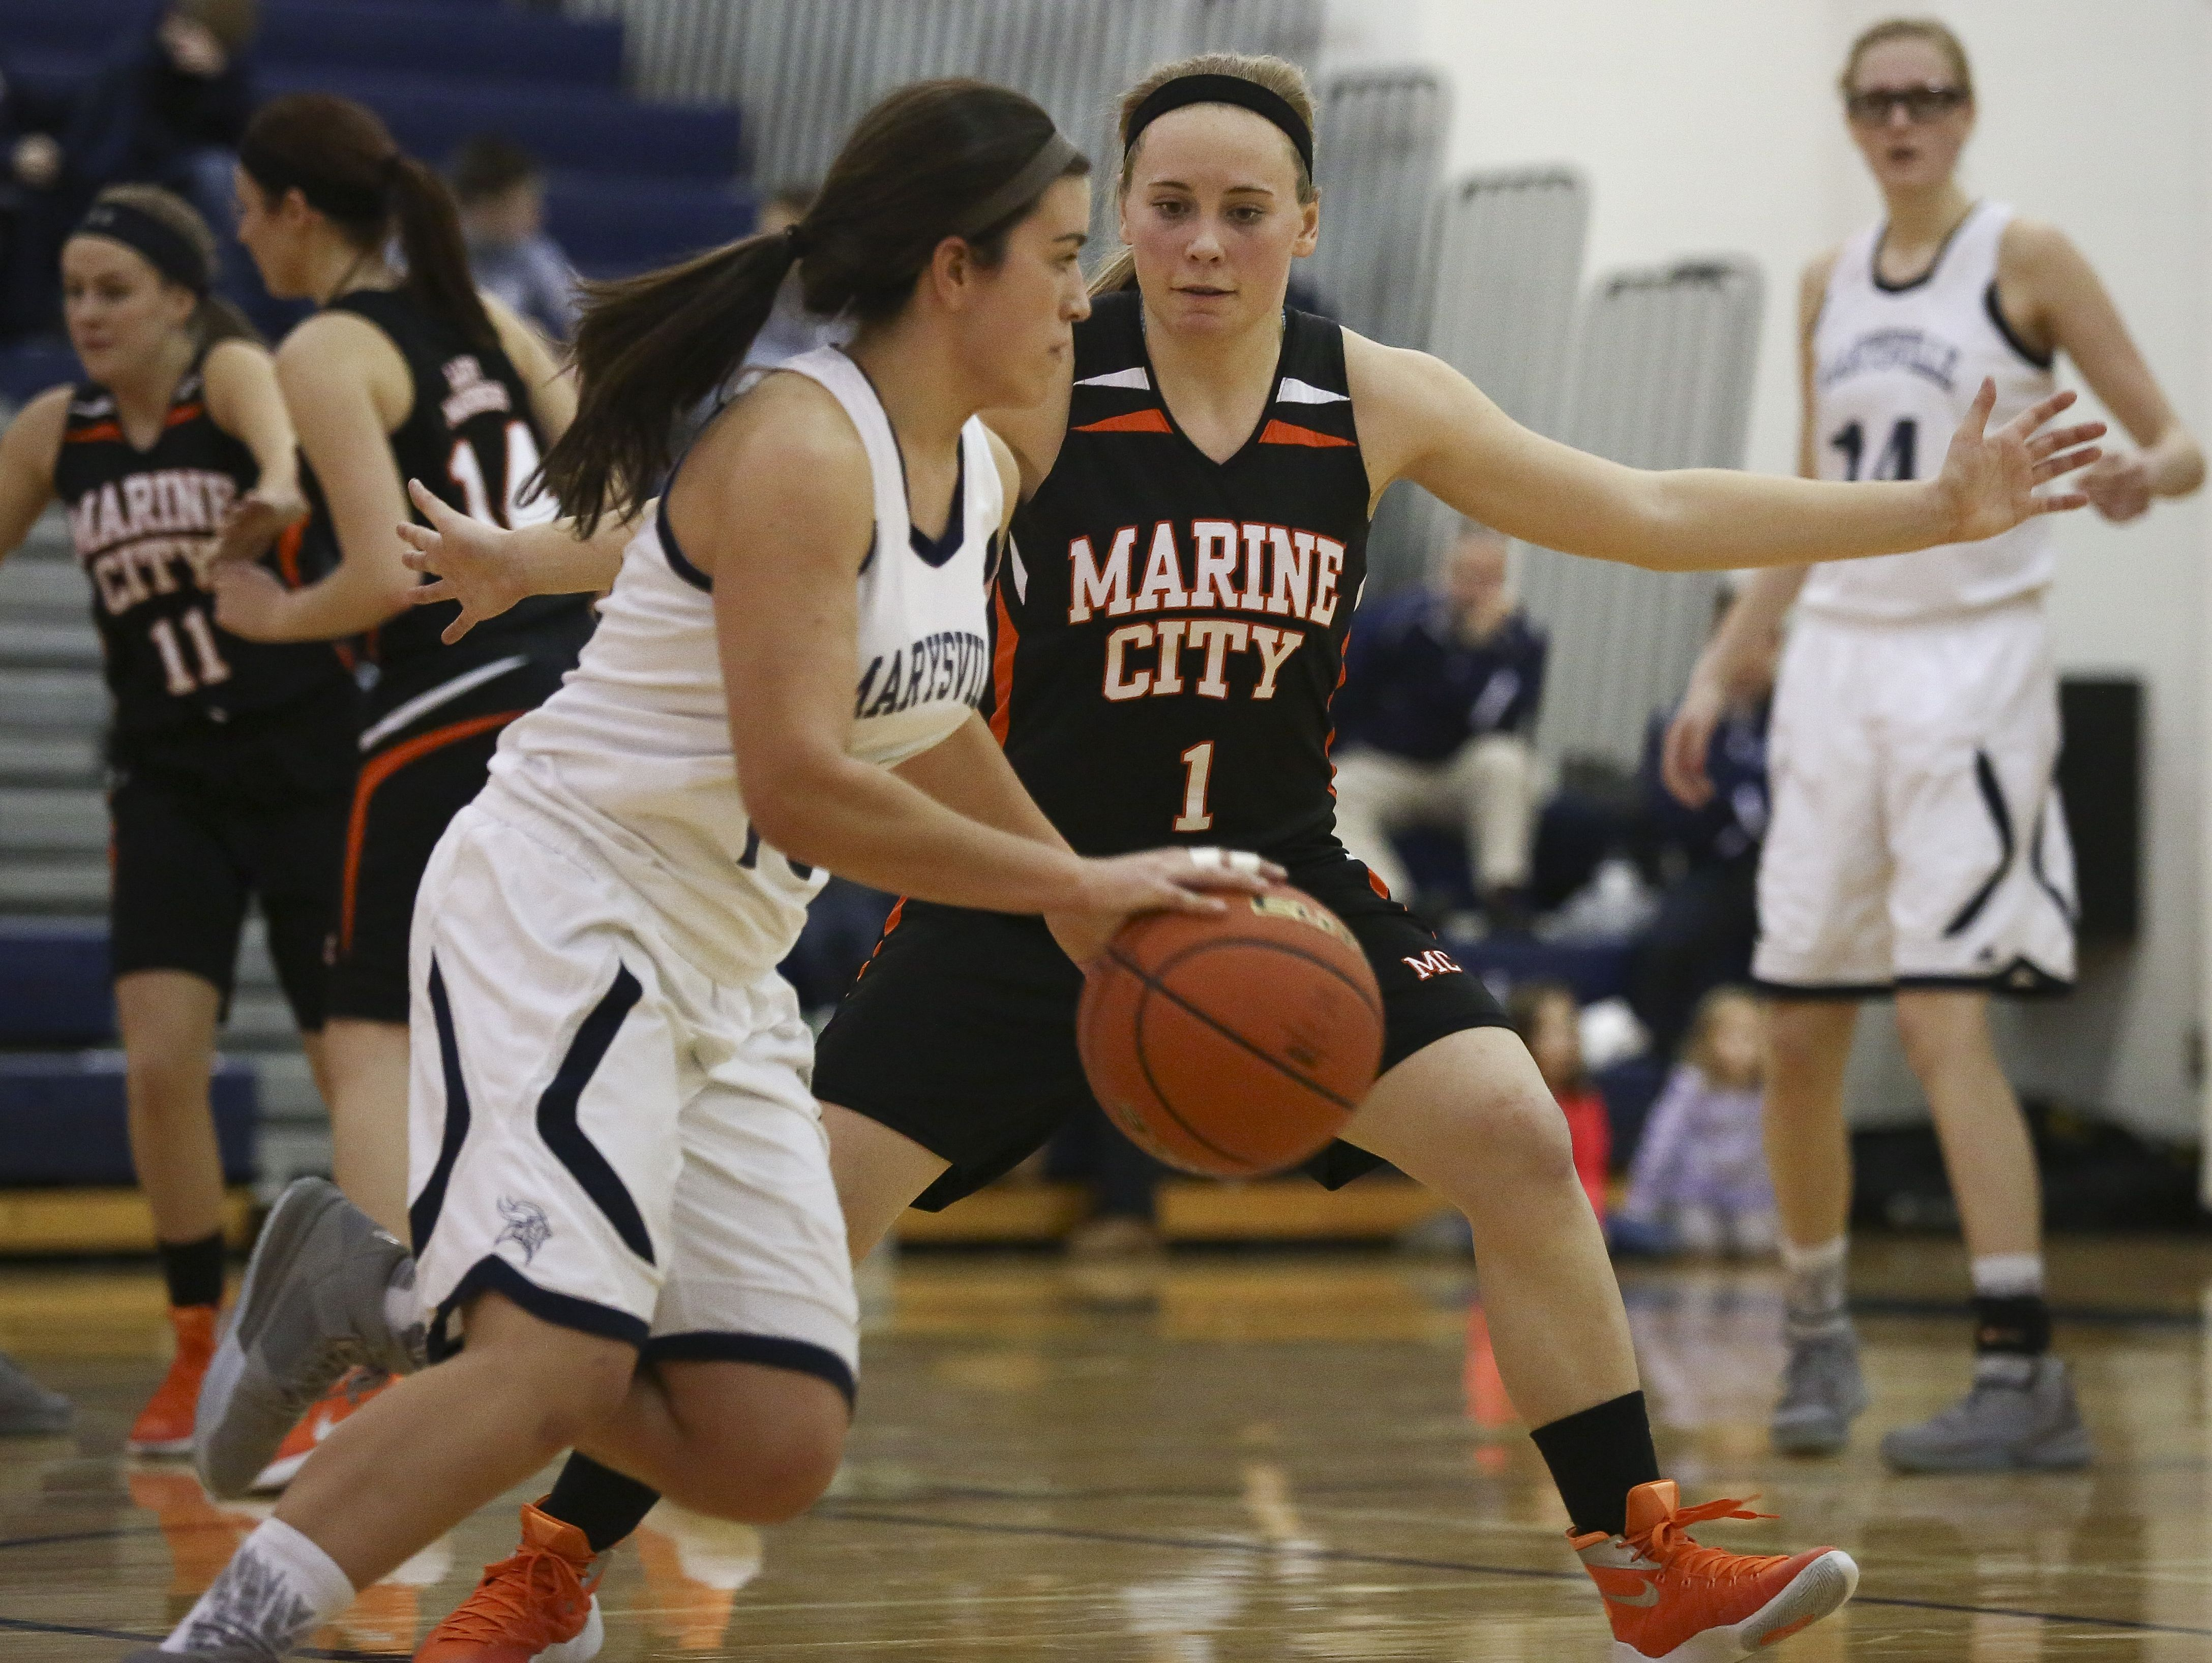 Marine City junior Antonia Potvin keeps pressure on Marysville junior Lydia Sawdon during a basketball game Friday, Jan. 8, 2016 at Marysville High School.